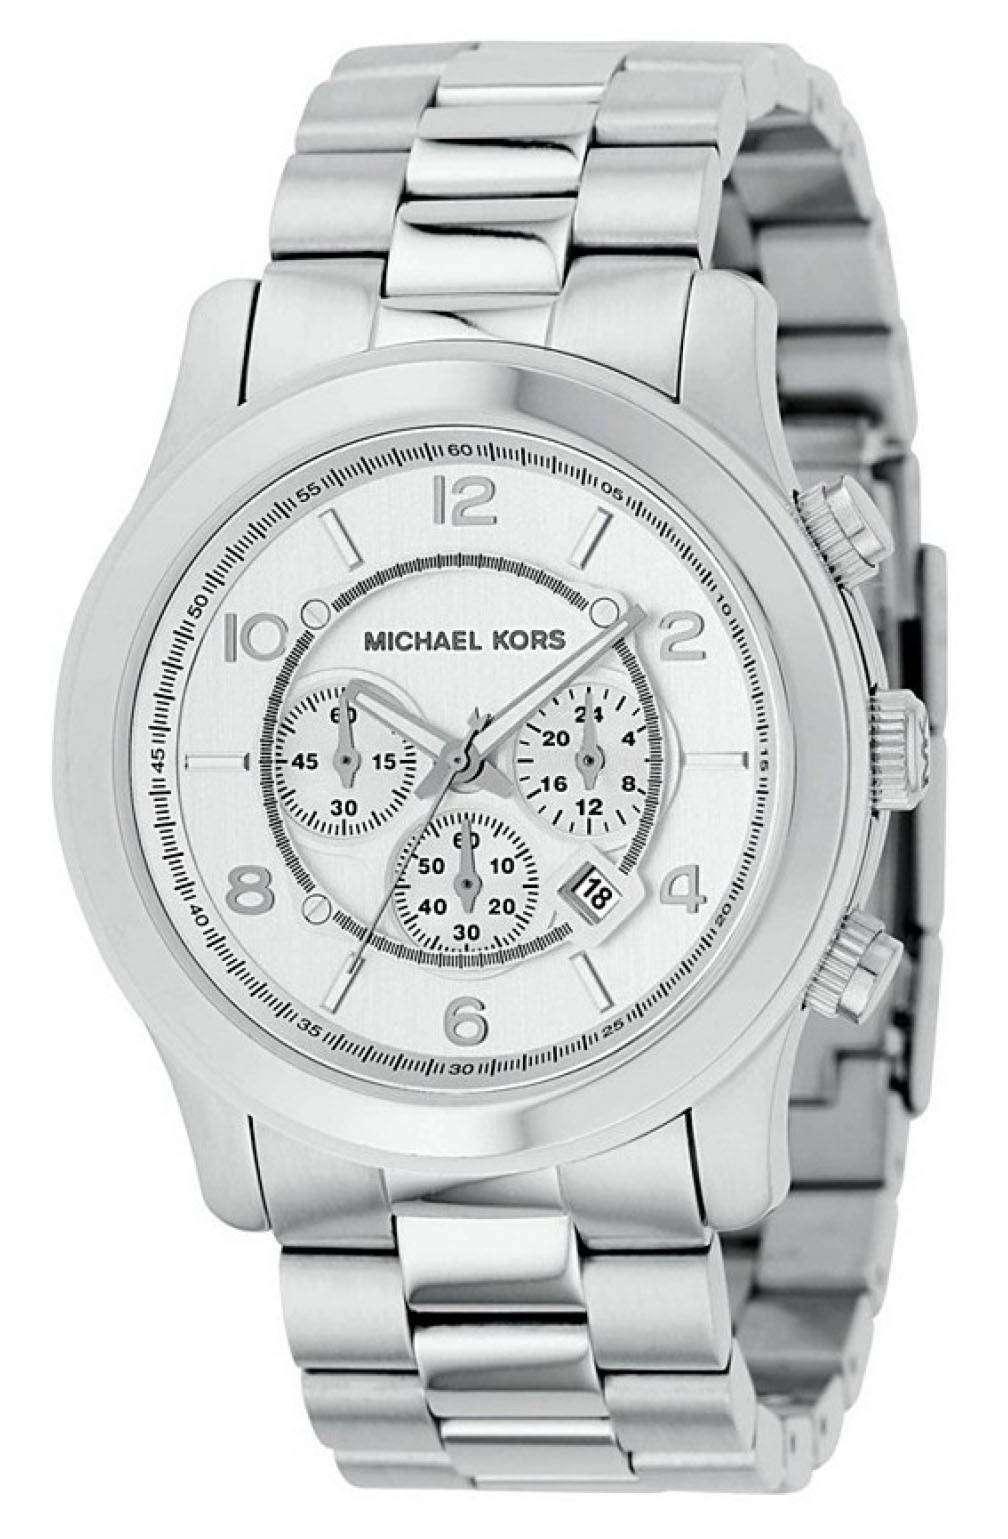 Michael Kors Watches - Jomashop | Page 2